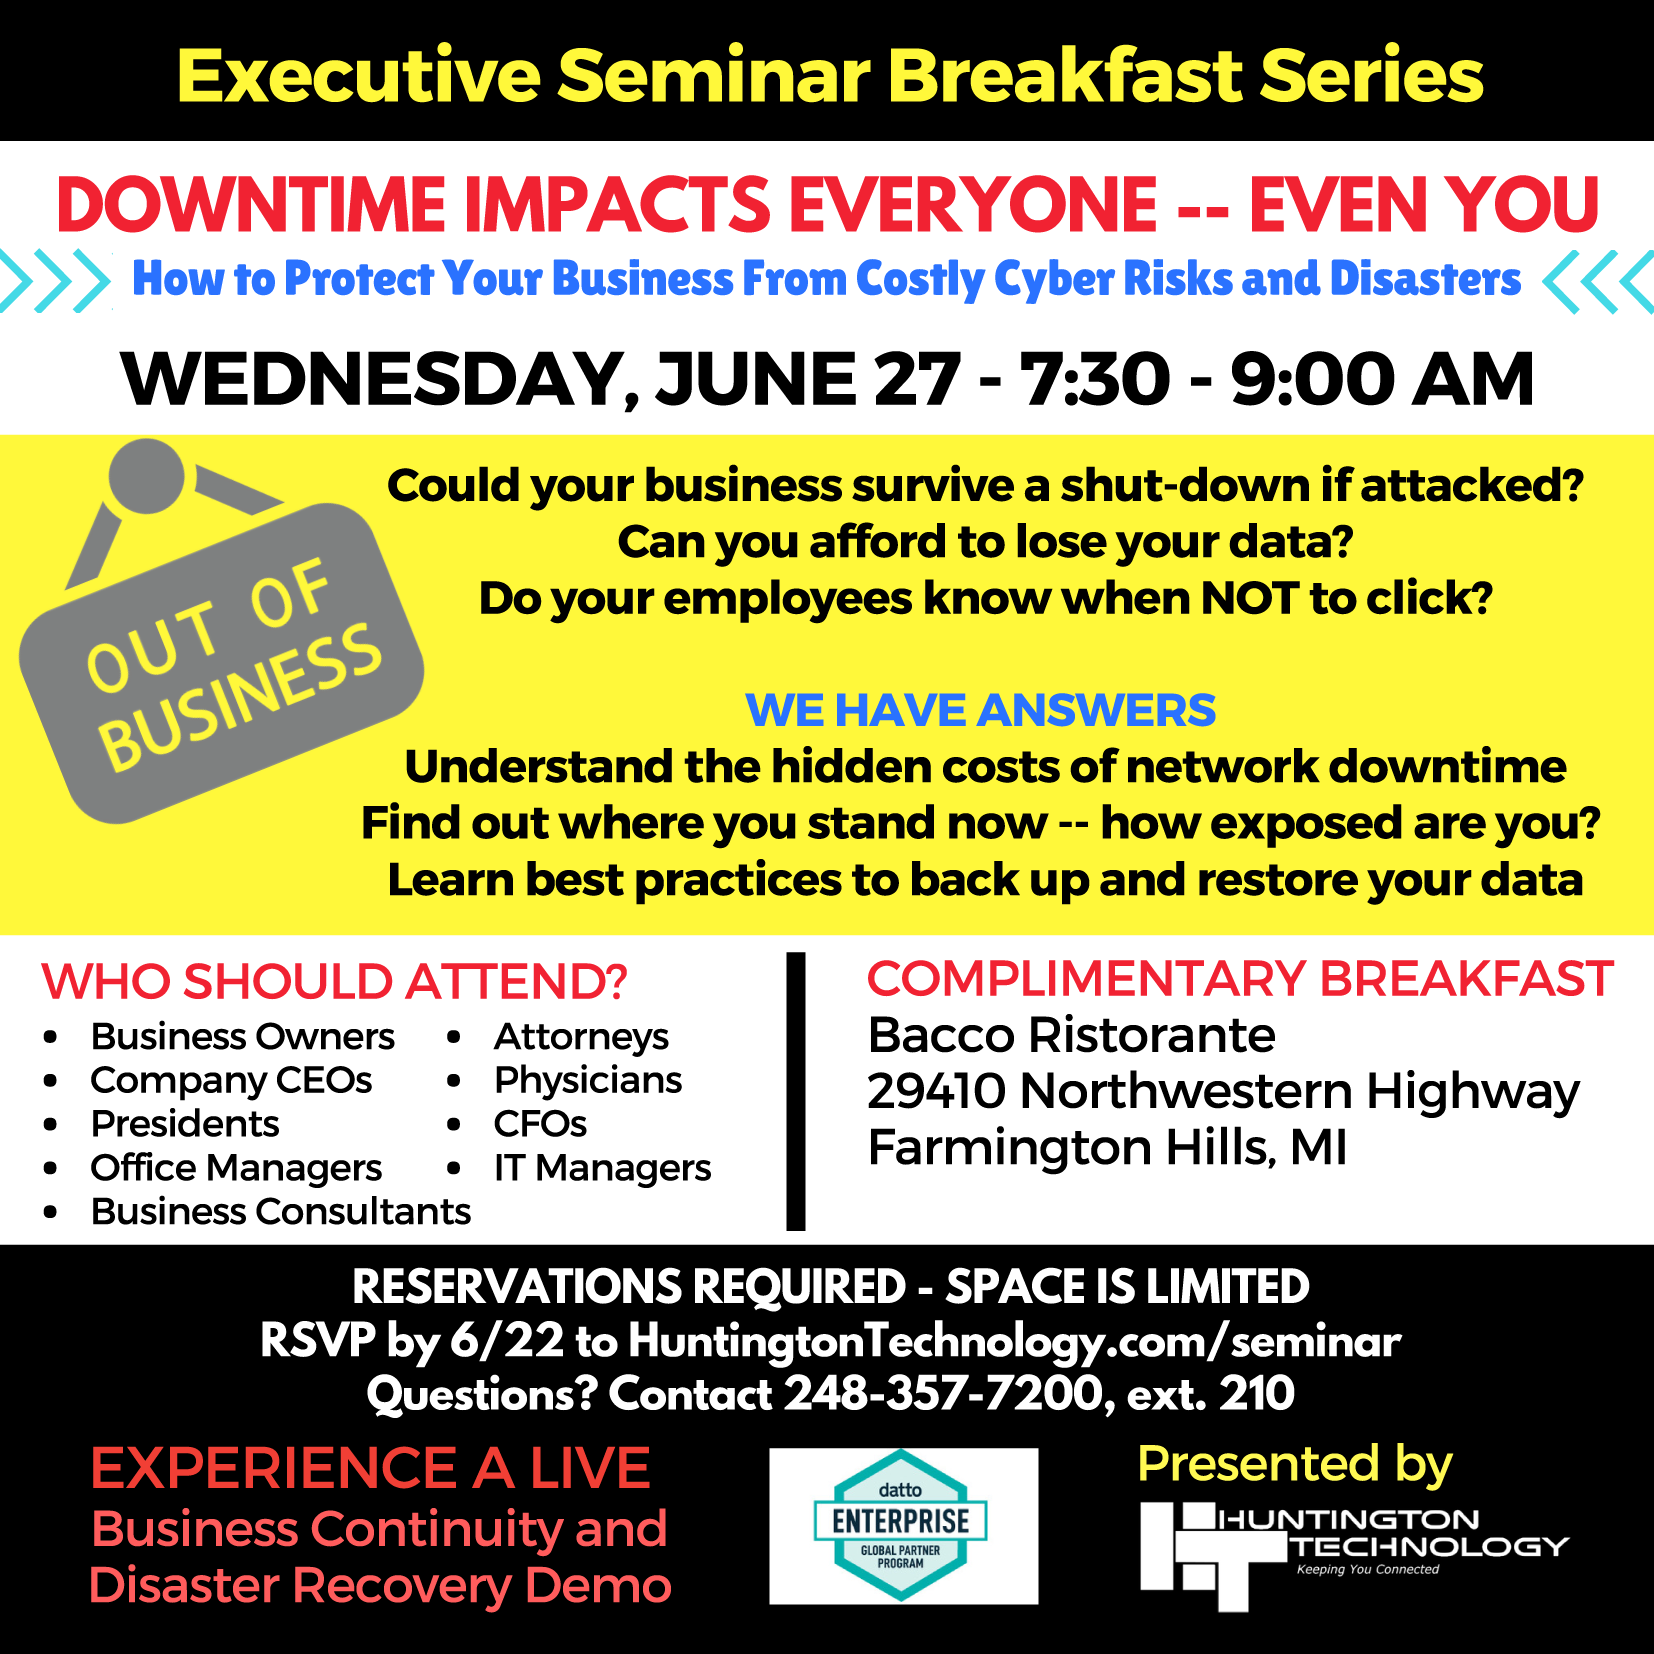 June 2018 - Executive Seminar Breakfast Series: Cyber